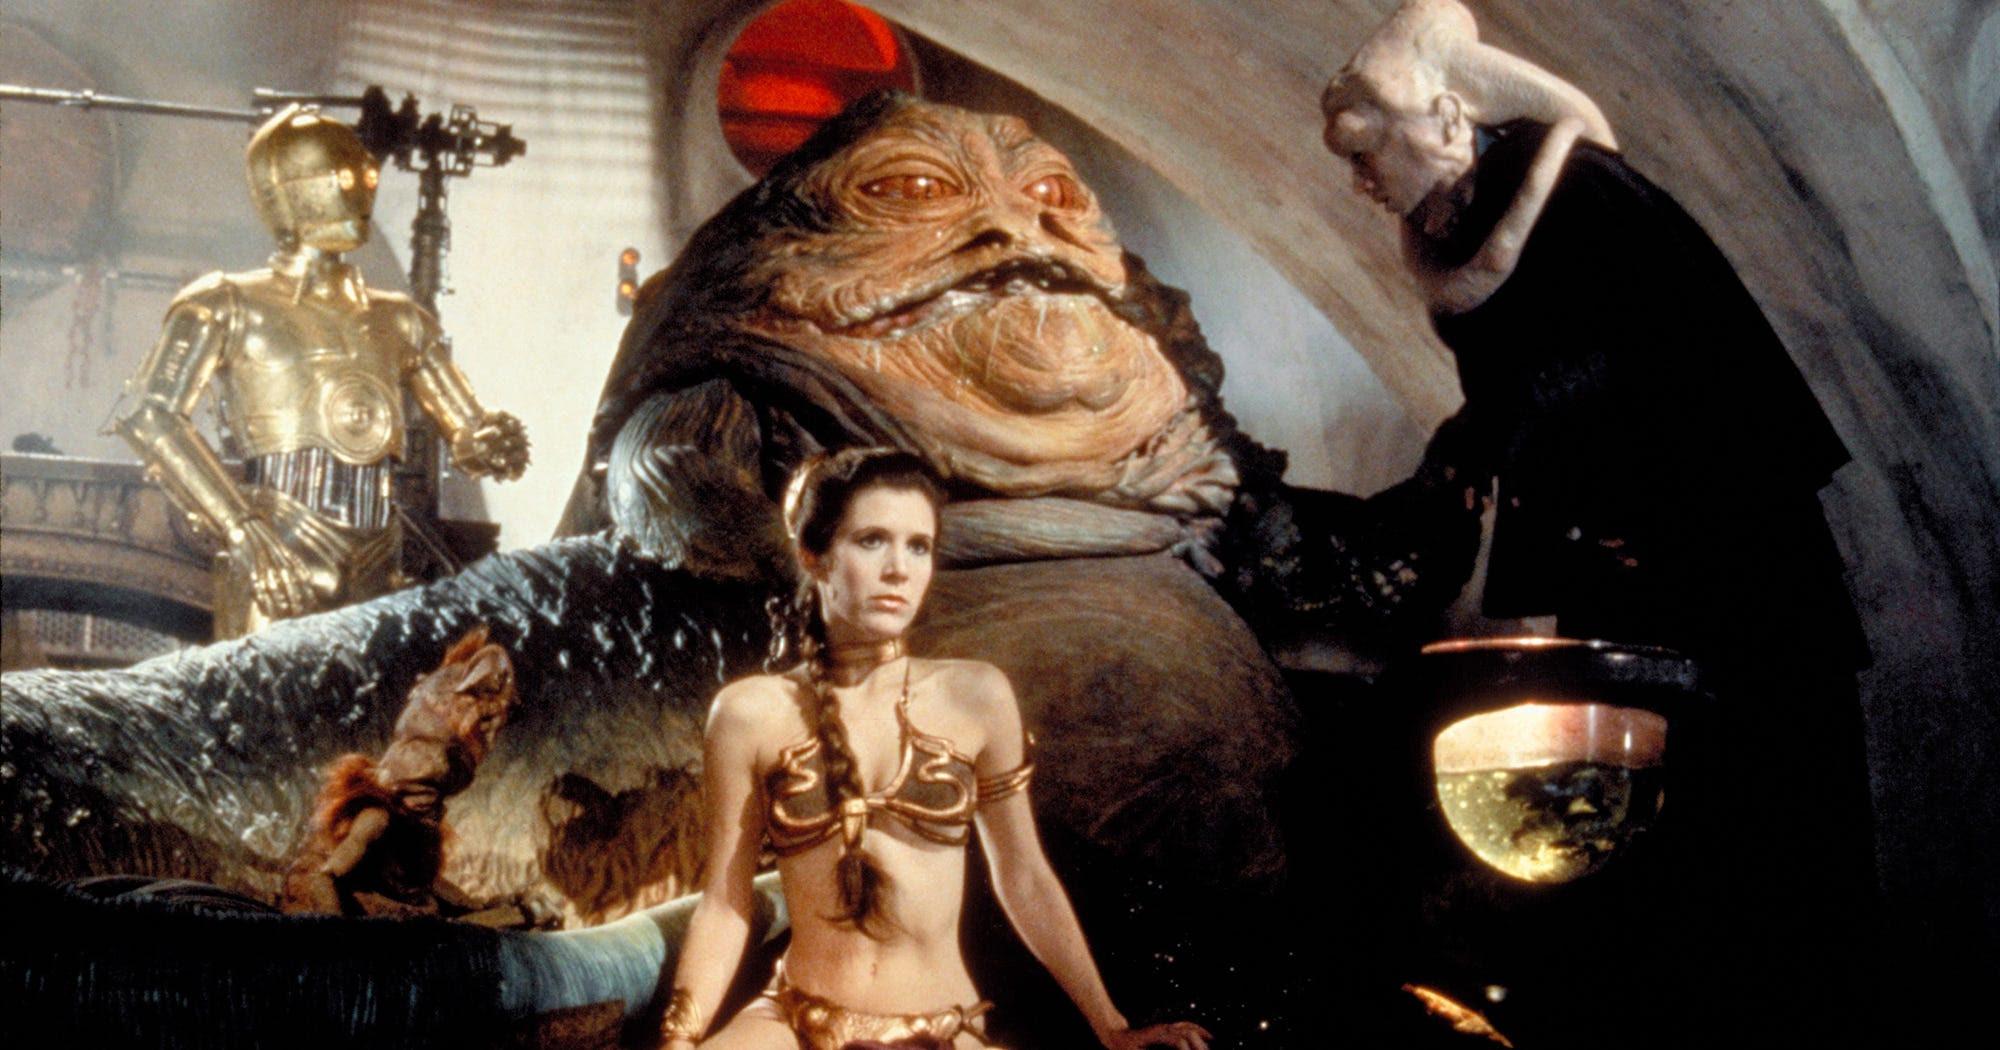 Star Wars XXX Popular Cosplay Porn Pornhub Video Search